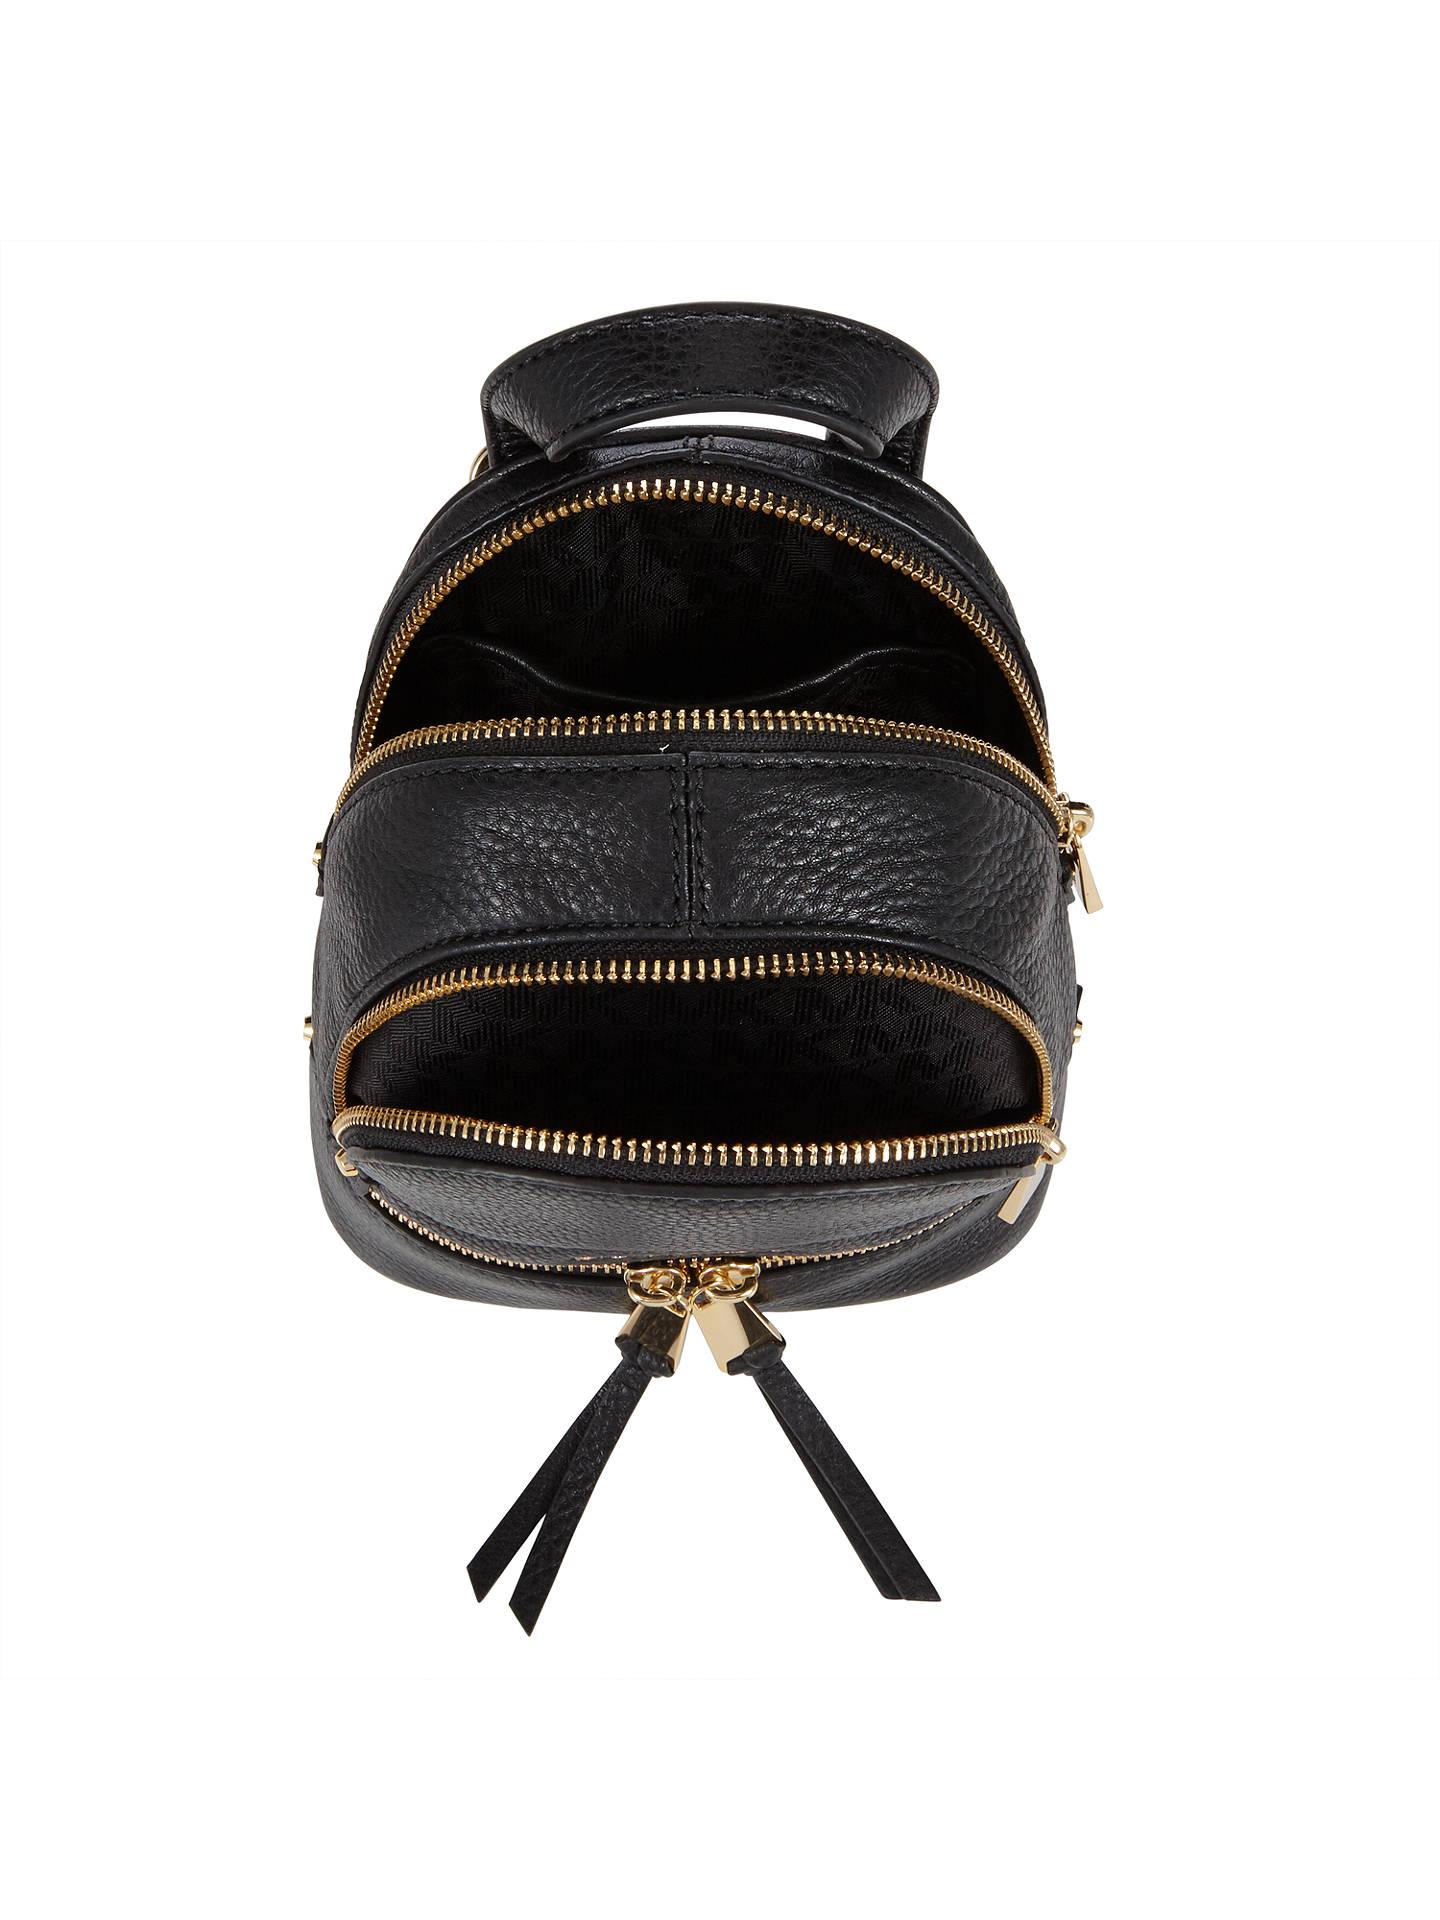 5d913de8cd82 ... store buymichael michael kors rhea extra small leather backpack pebbled  black online at johnlewis eda7b fdb40